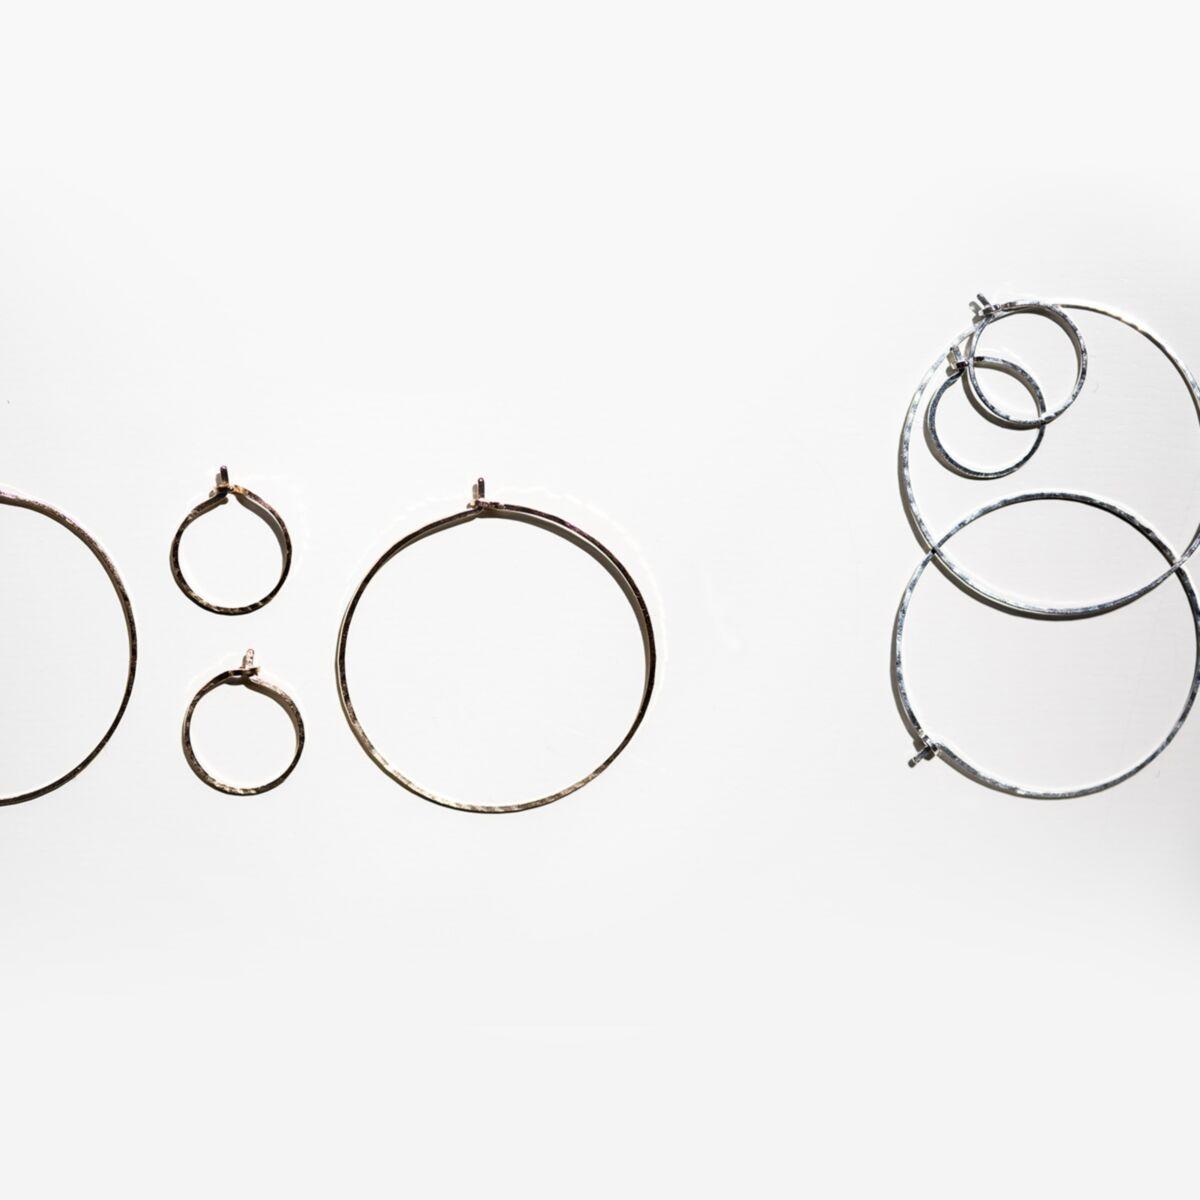 Hoop Dream Earring, silver (single) image